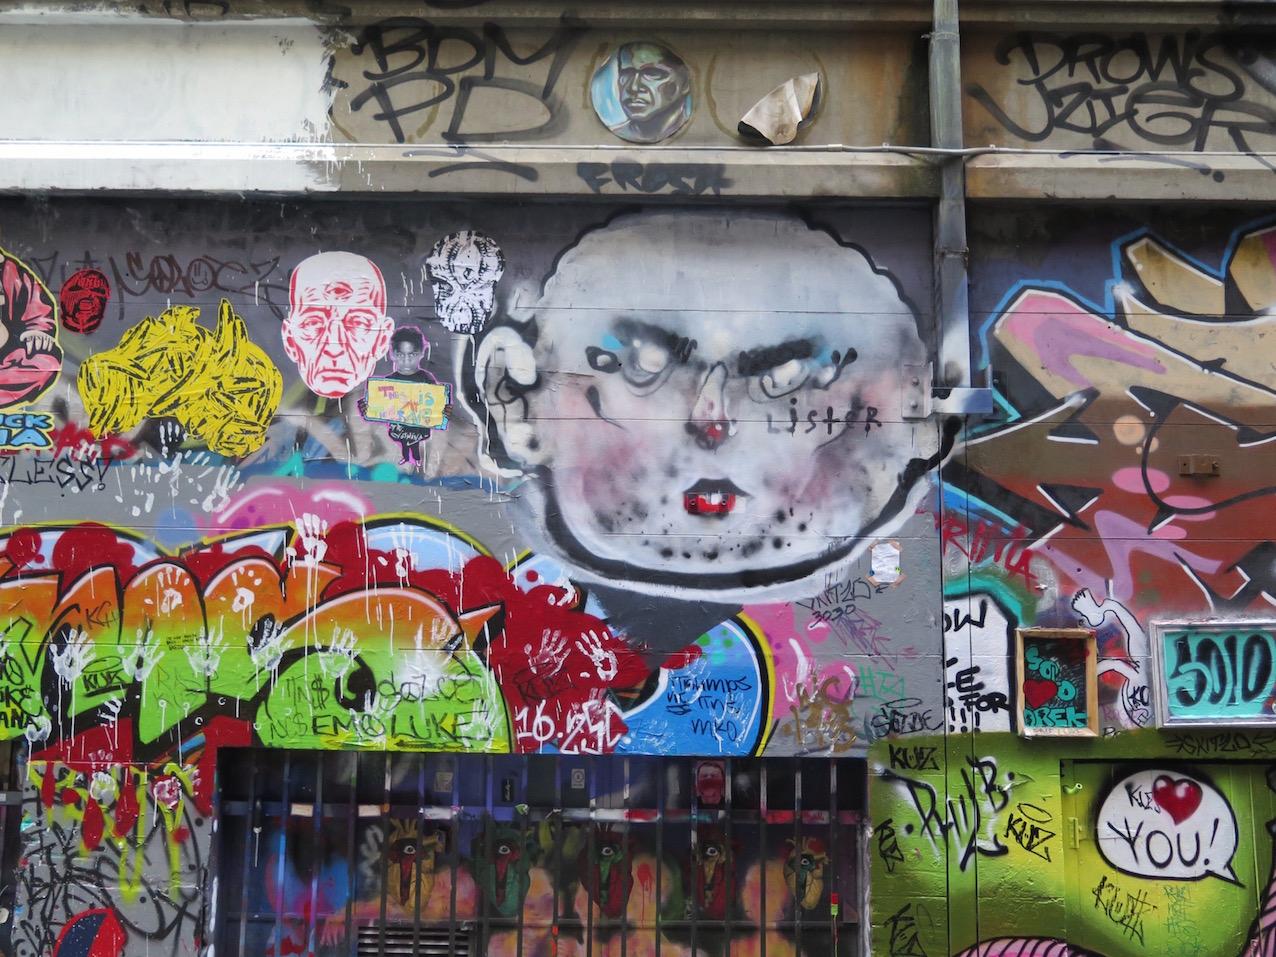 deansunshine_landofsunshine_melbourne_streetart_graffiti_lister does melb march 16 3